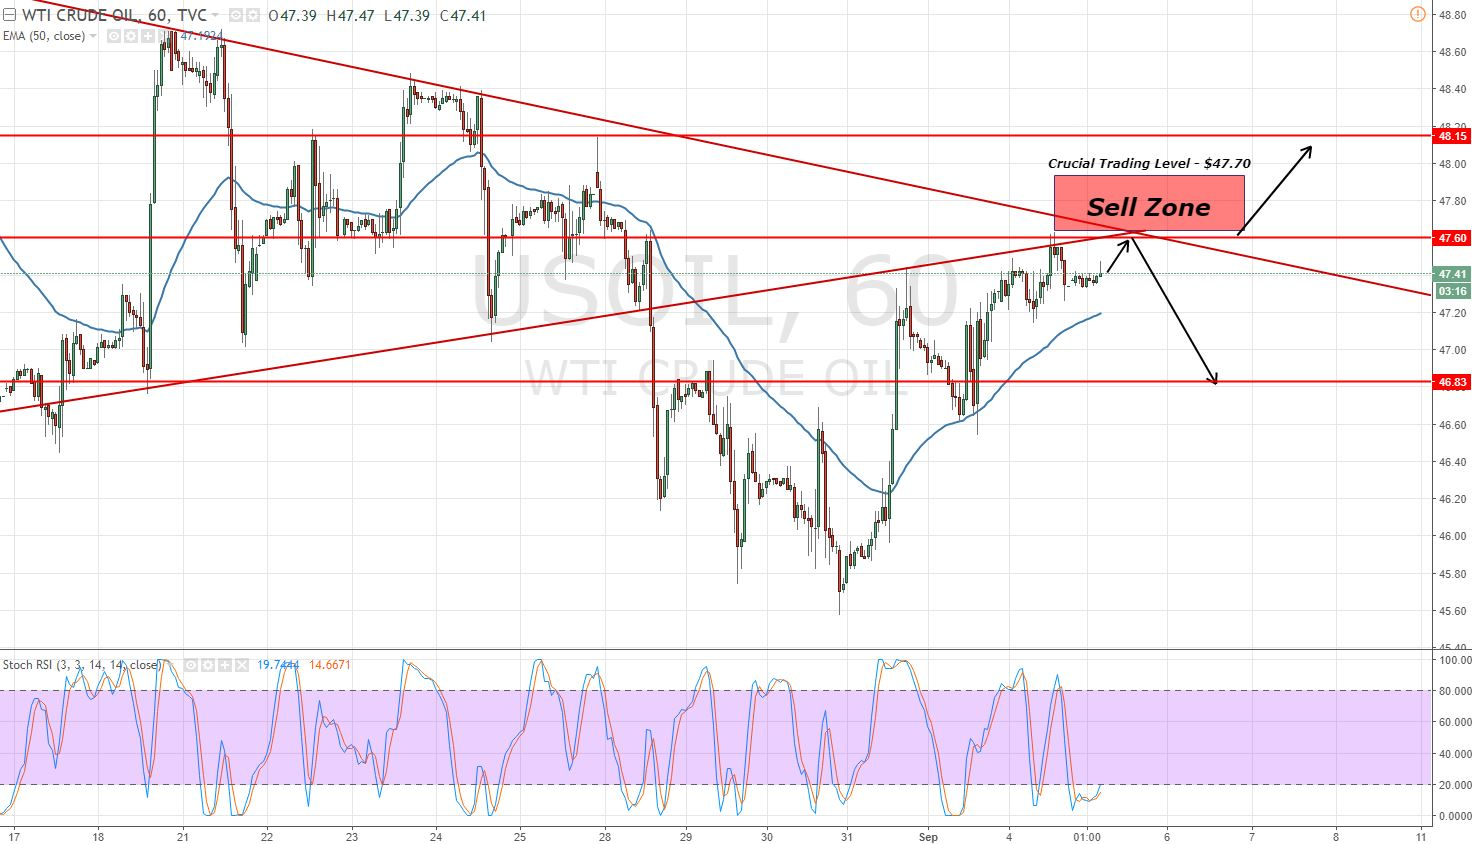 Crude Oil - Hourly Chart - Symmetric Triangle Patttern